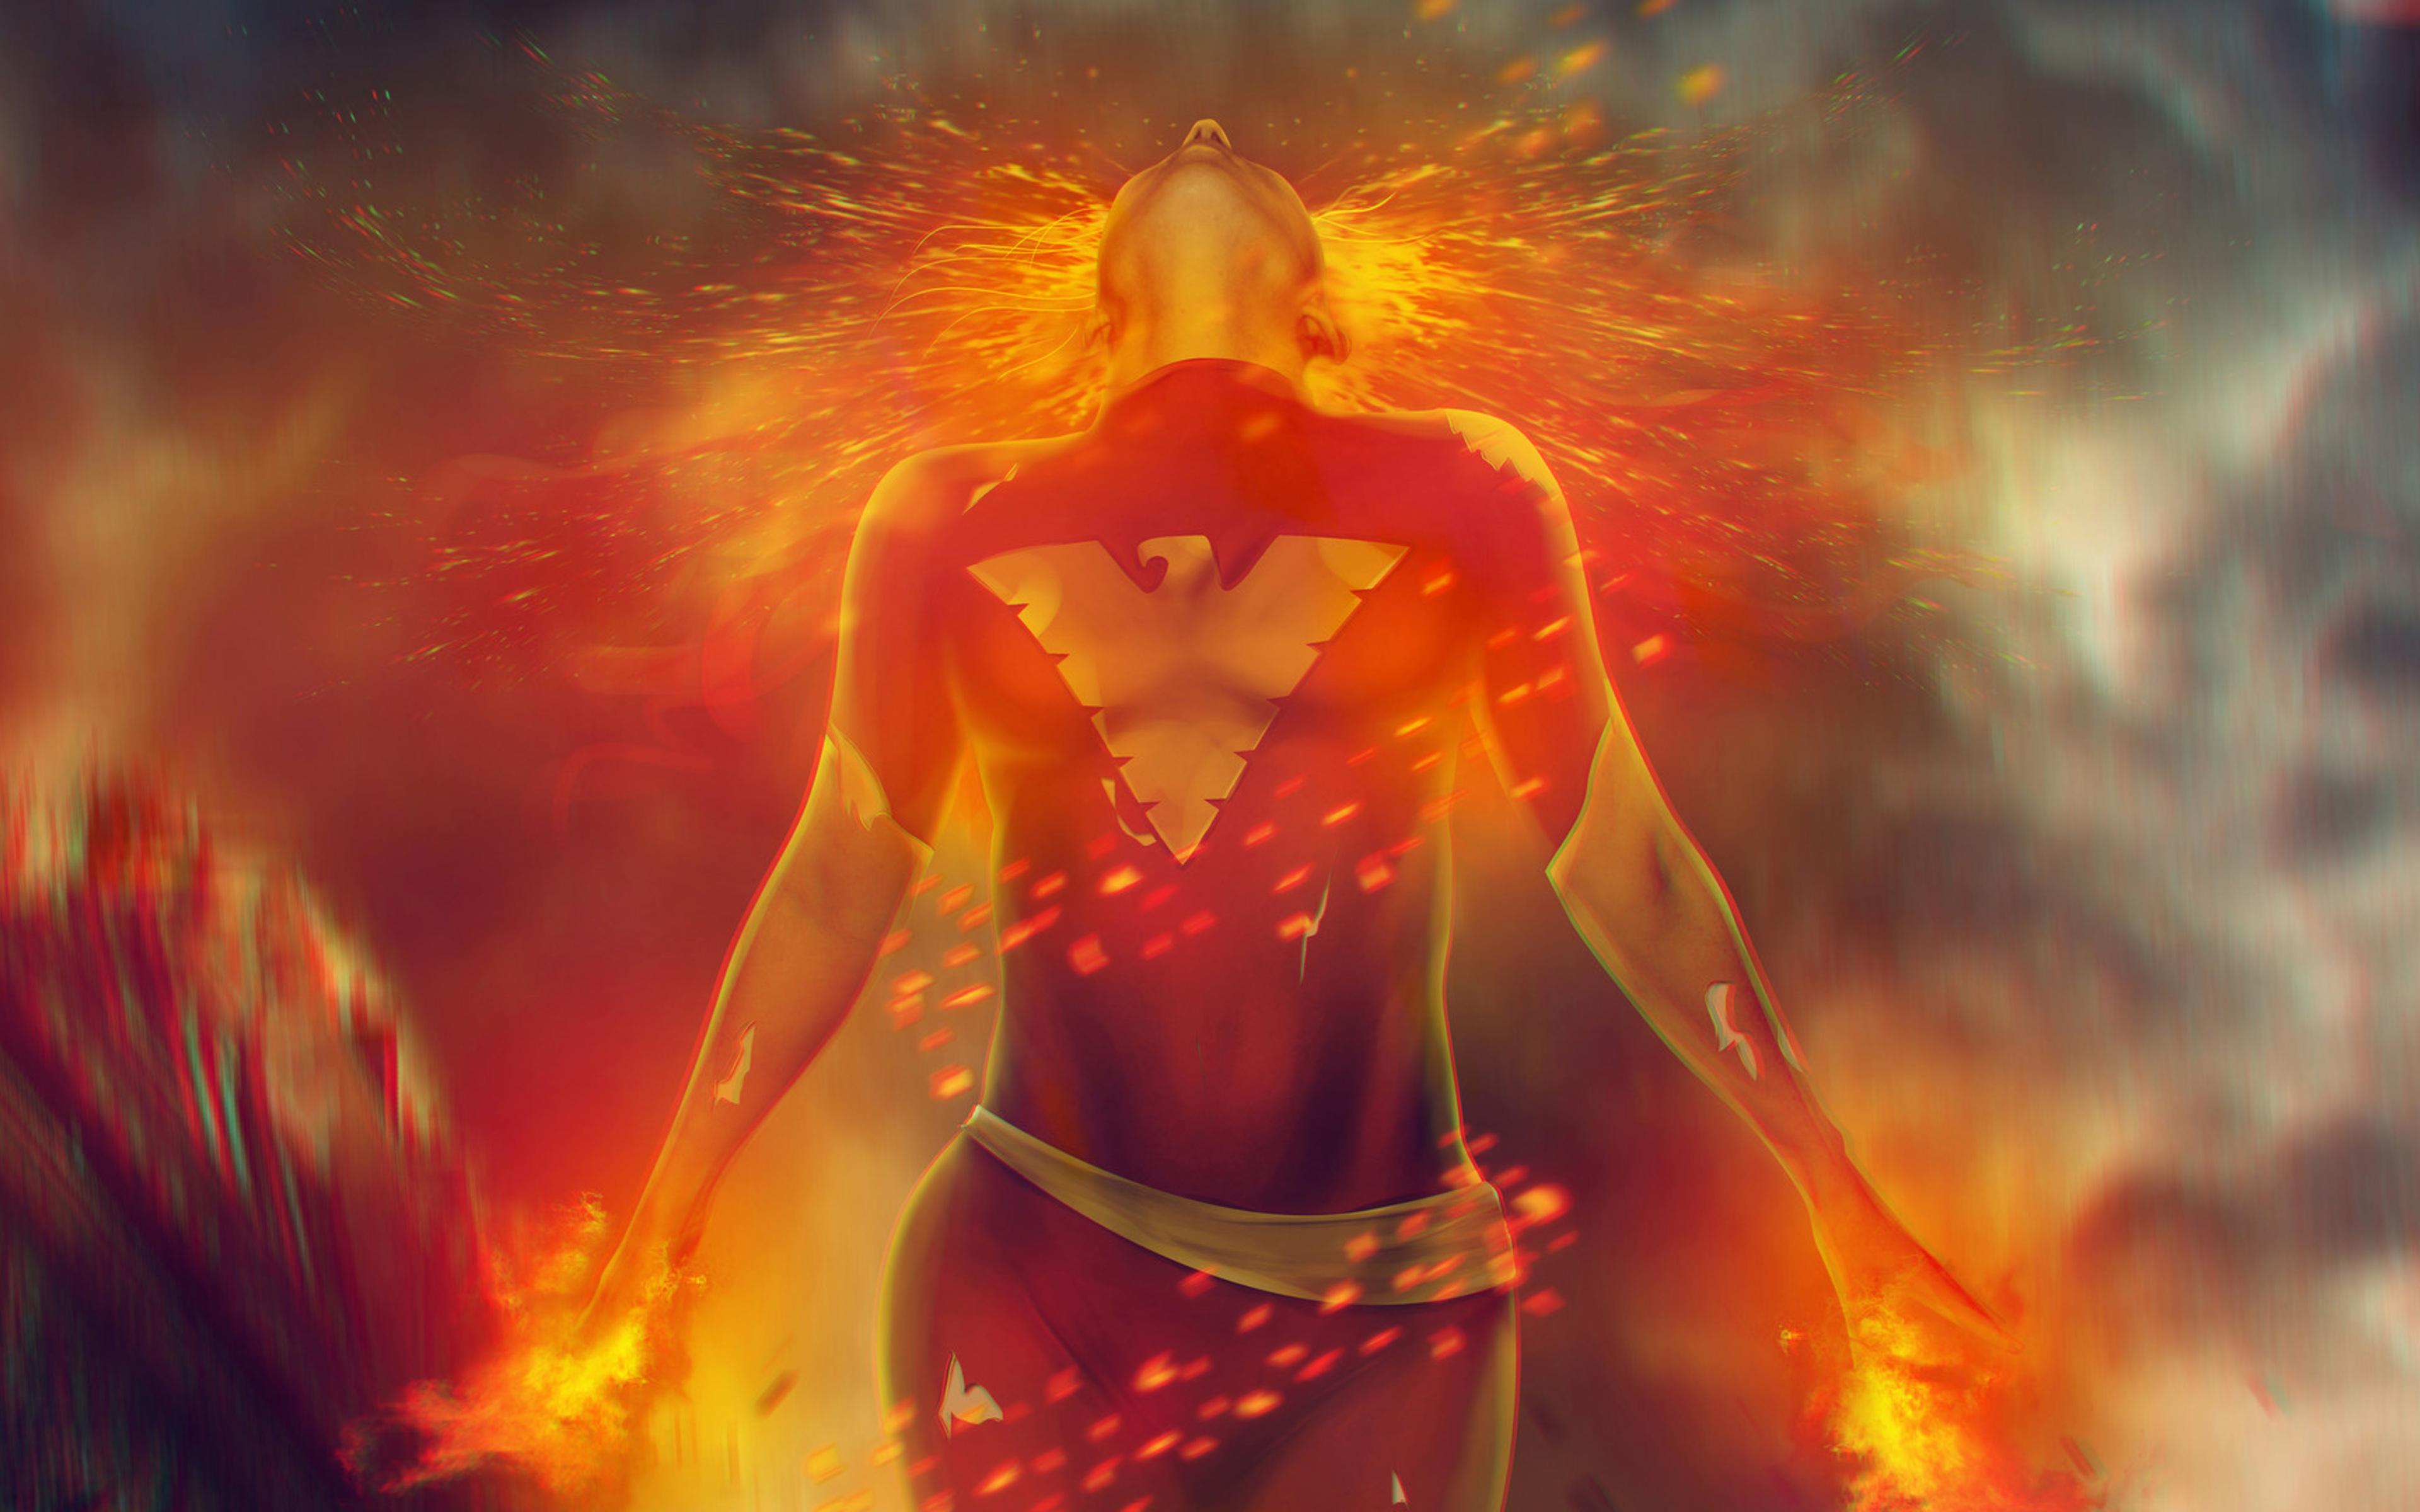 Jean Grey From X Men Dark Phoenix Wallpaper 4k Ultra Hd Id4230